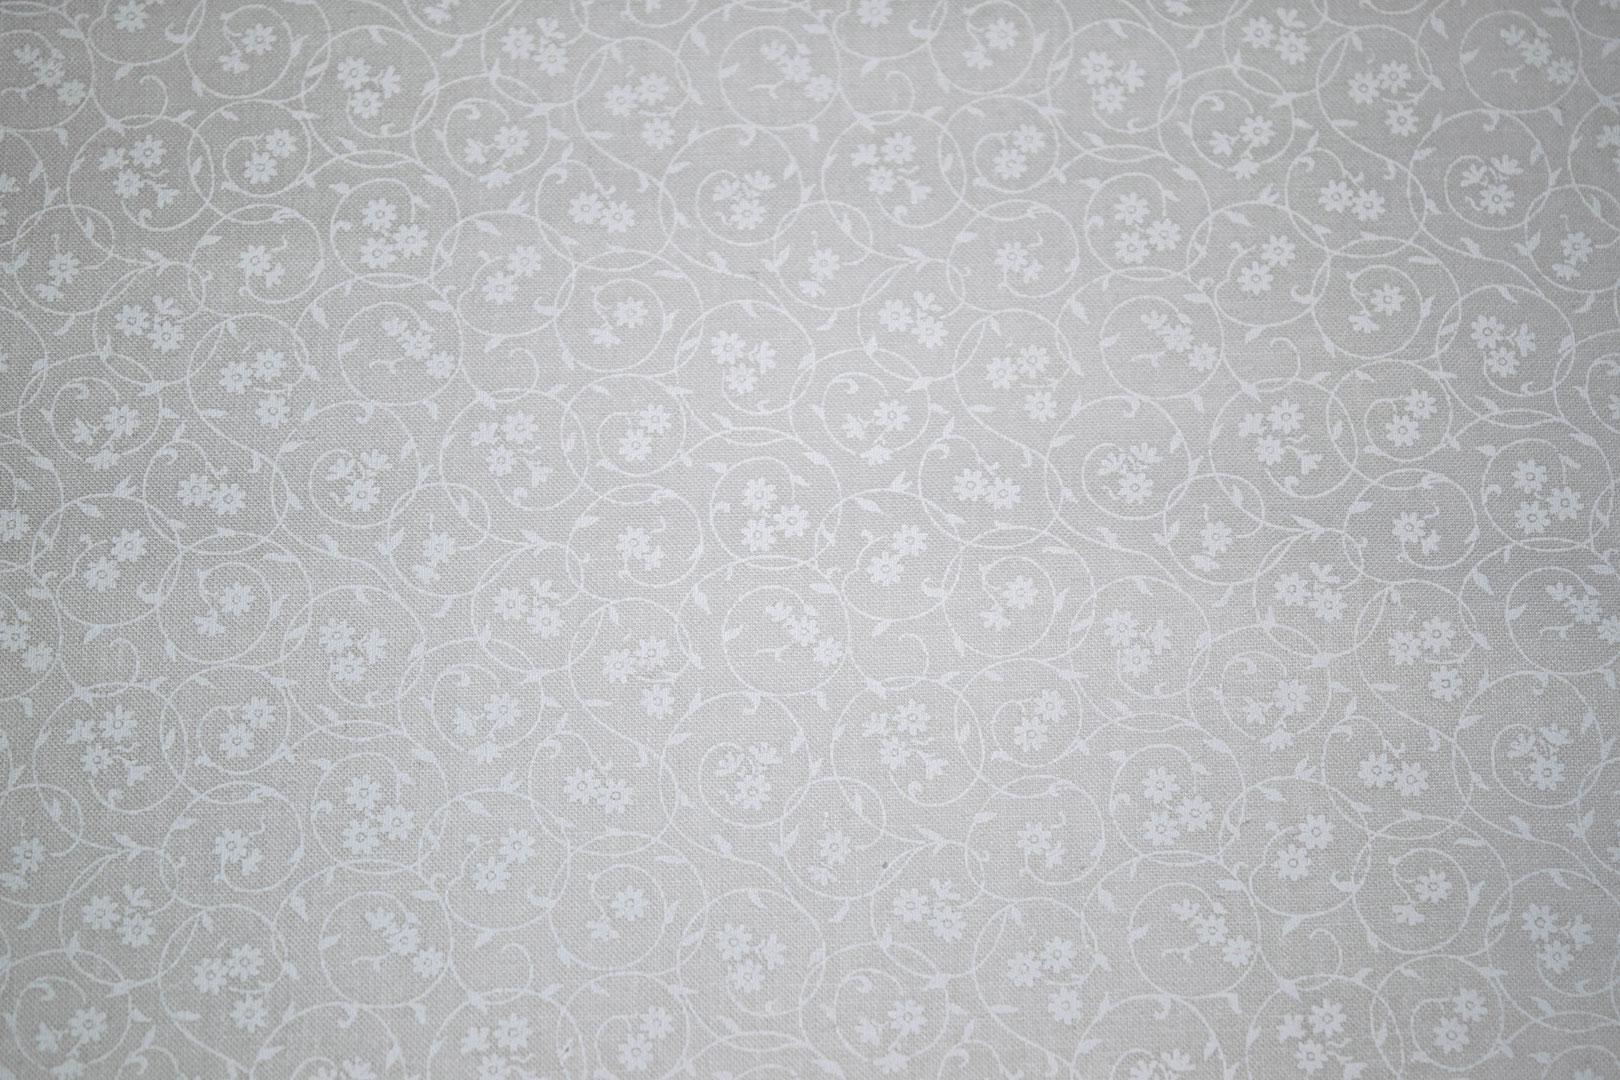 "8_37127_ww   44/45"" 68/68, 100% Carded Cotton"